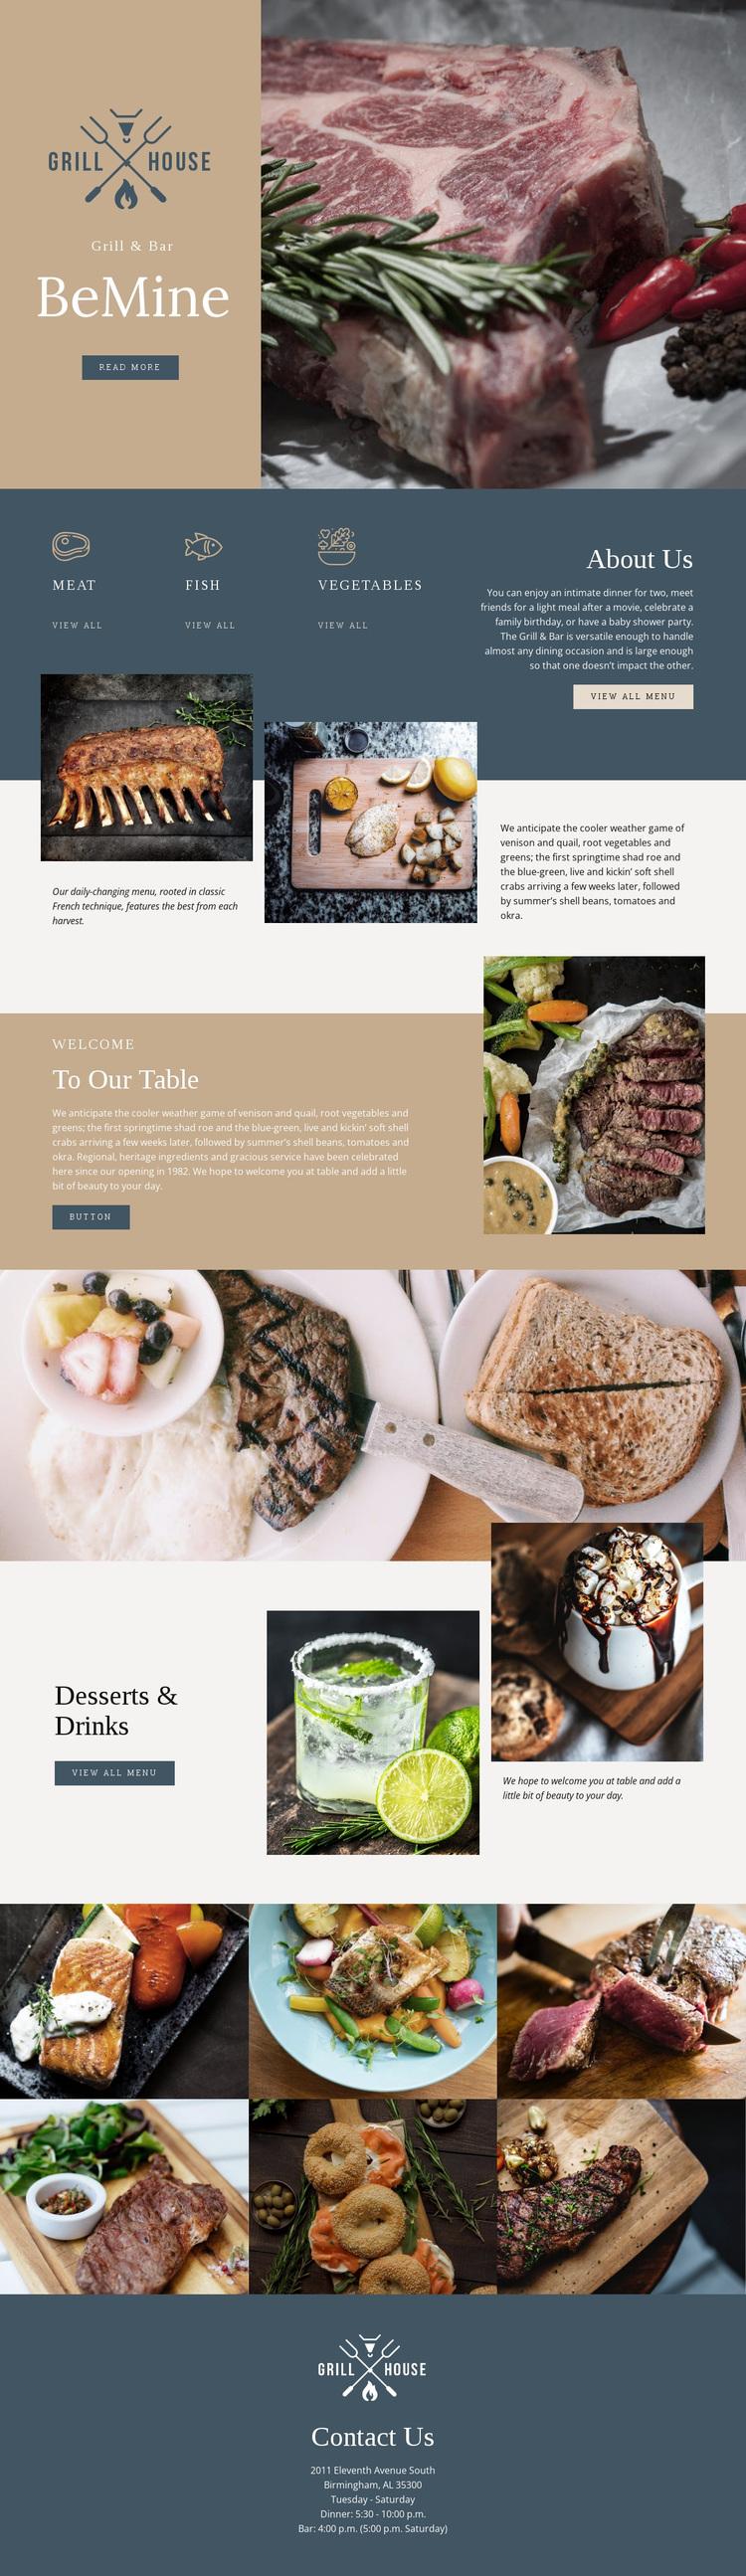 Finest grill house restaurant Joomla Page Builder